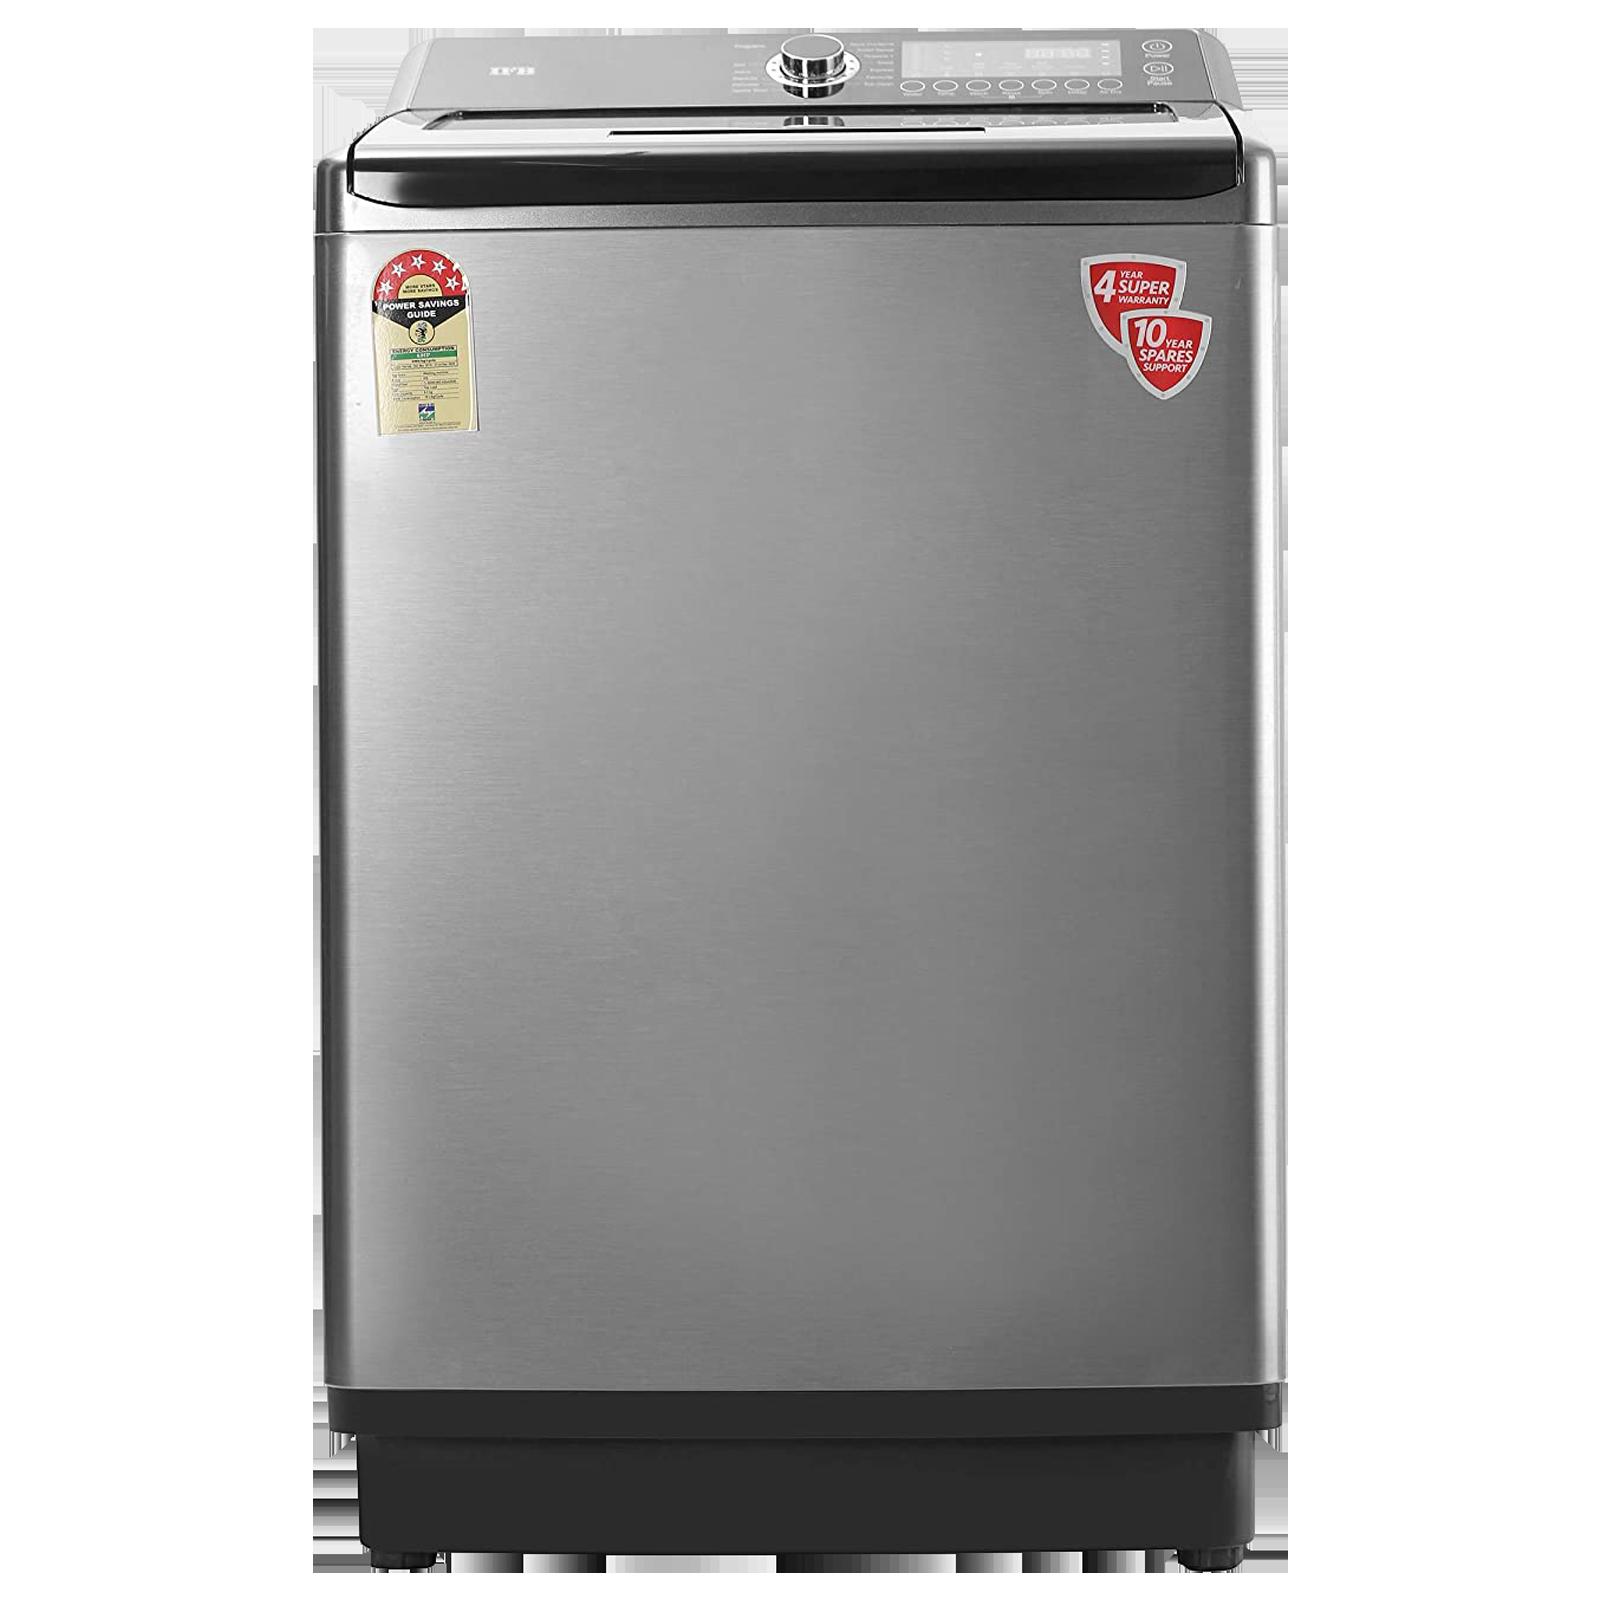 IFB Aqua 10.5 kg 5 Star Fully Automatic Top Load Washing Machine (Built-In Heater, TL-SDIN, PCM - Inox)_1